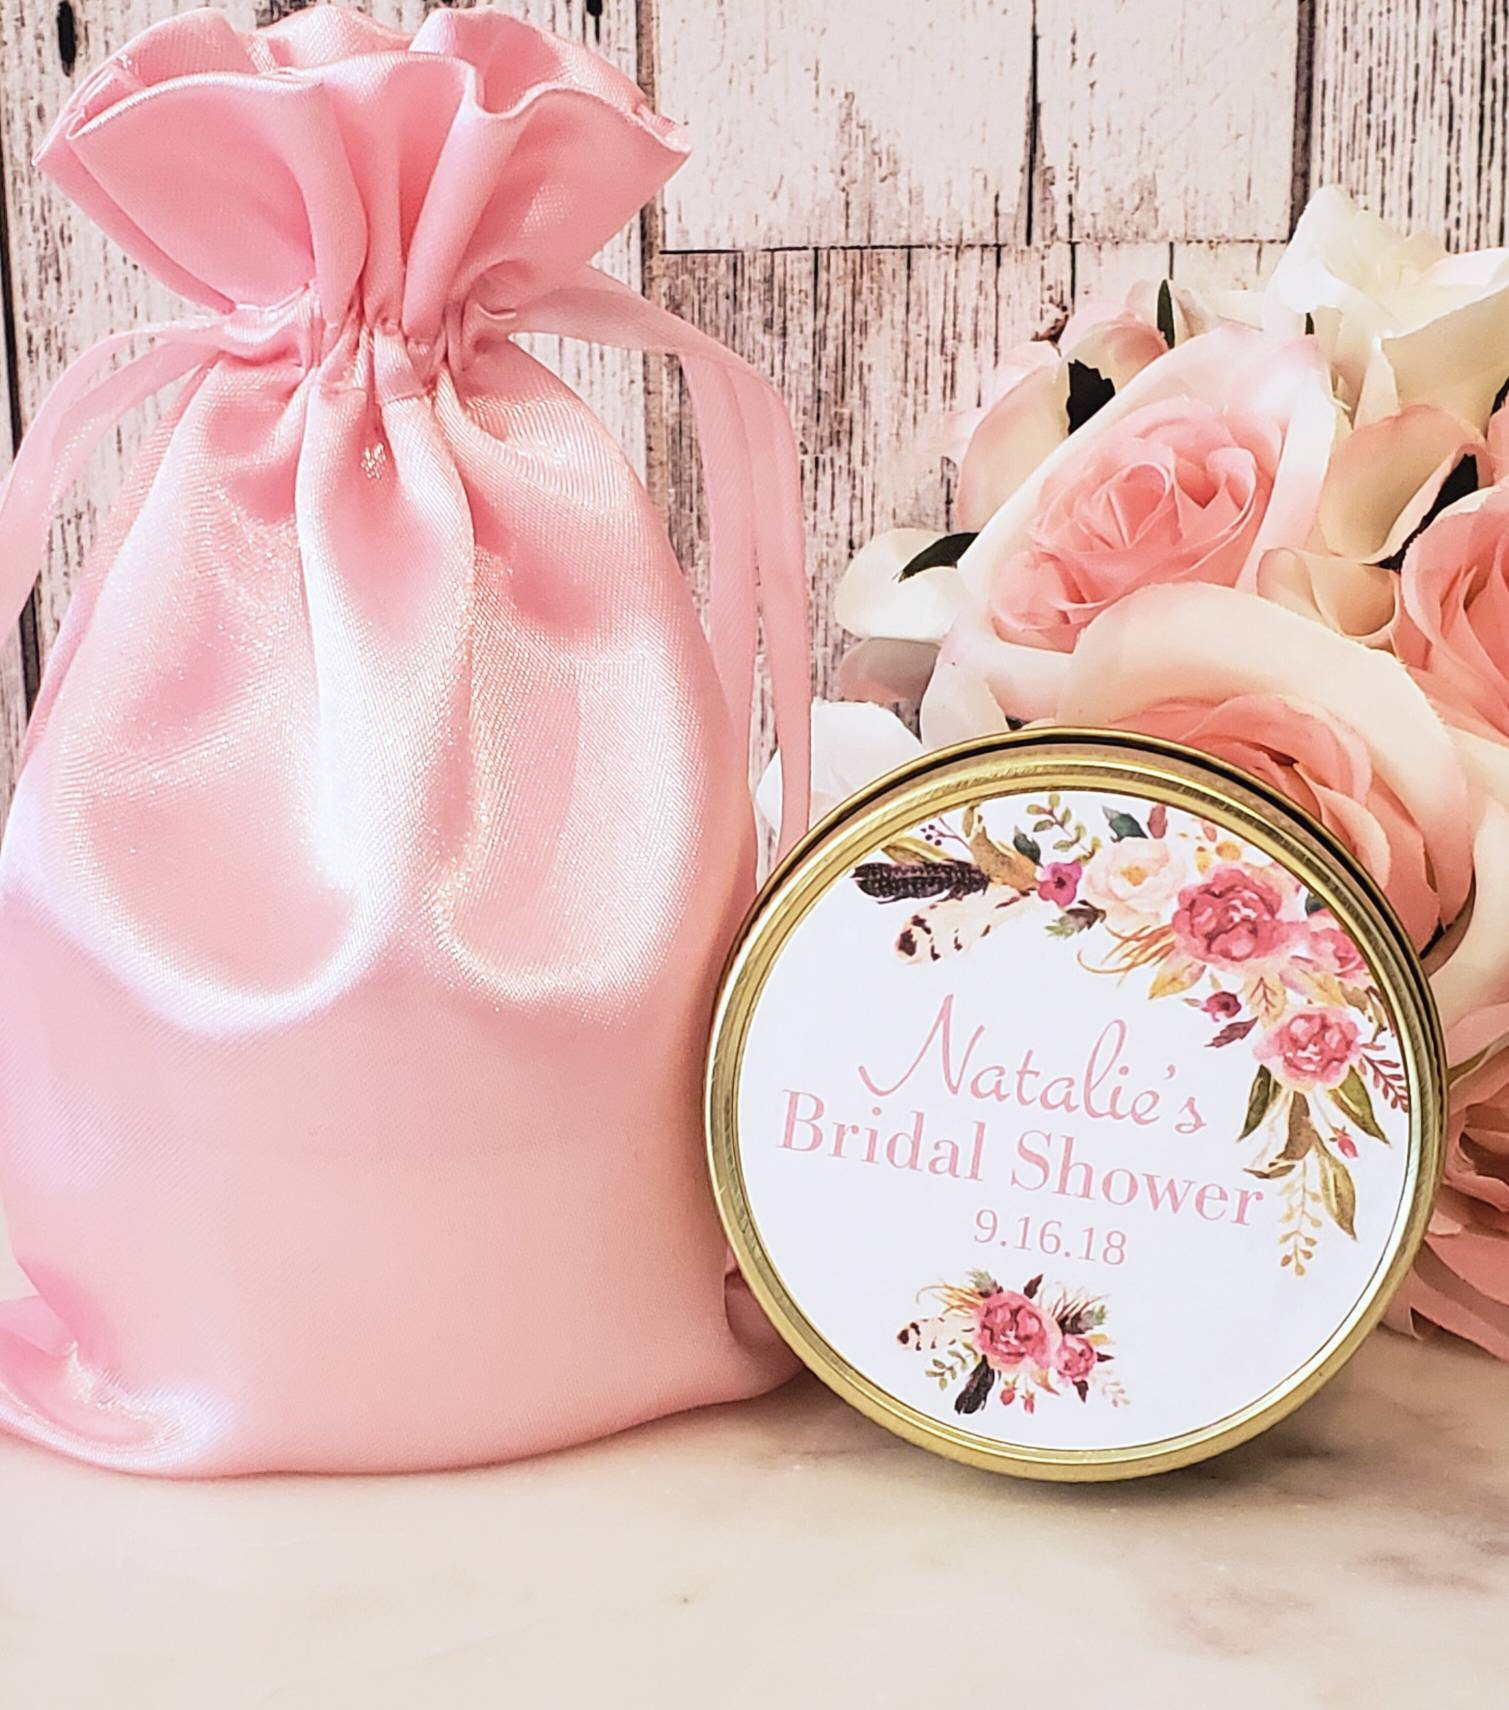 Blush Bridal Shower Favors - Bridal Shower Candle Favors - Blush ...